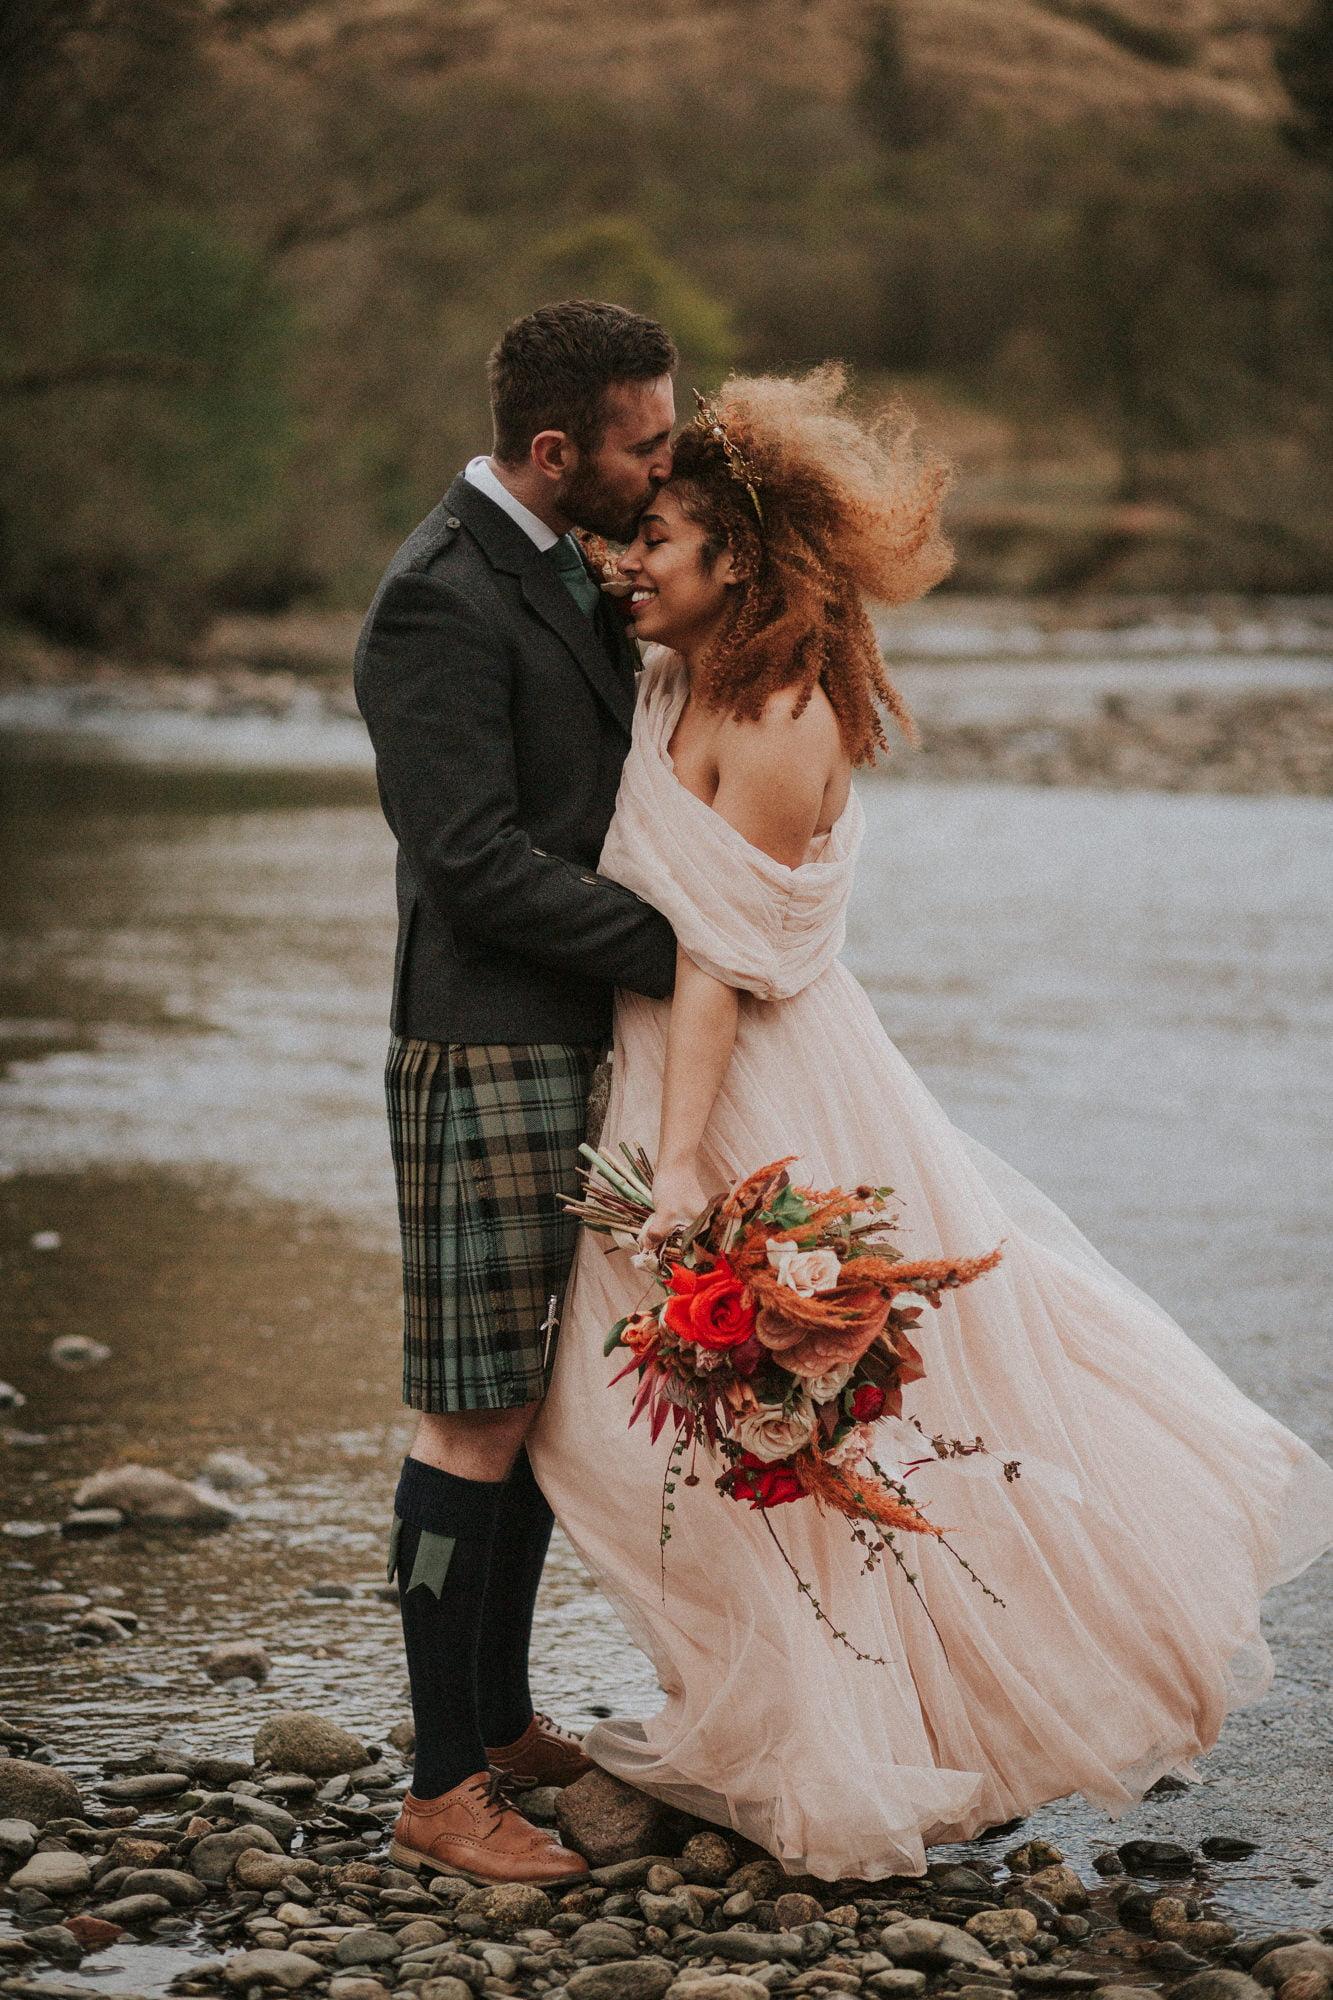 Elopement Photographer Scotland - St Mary's Space, the secret wedding venue in Scottish Highlands